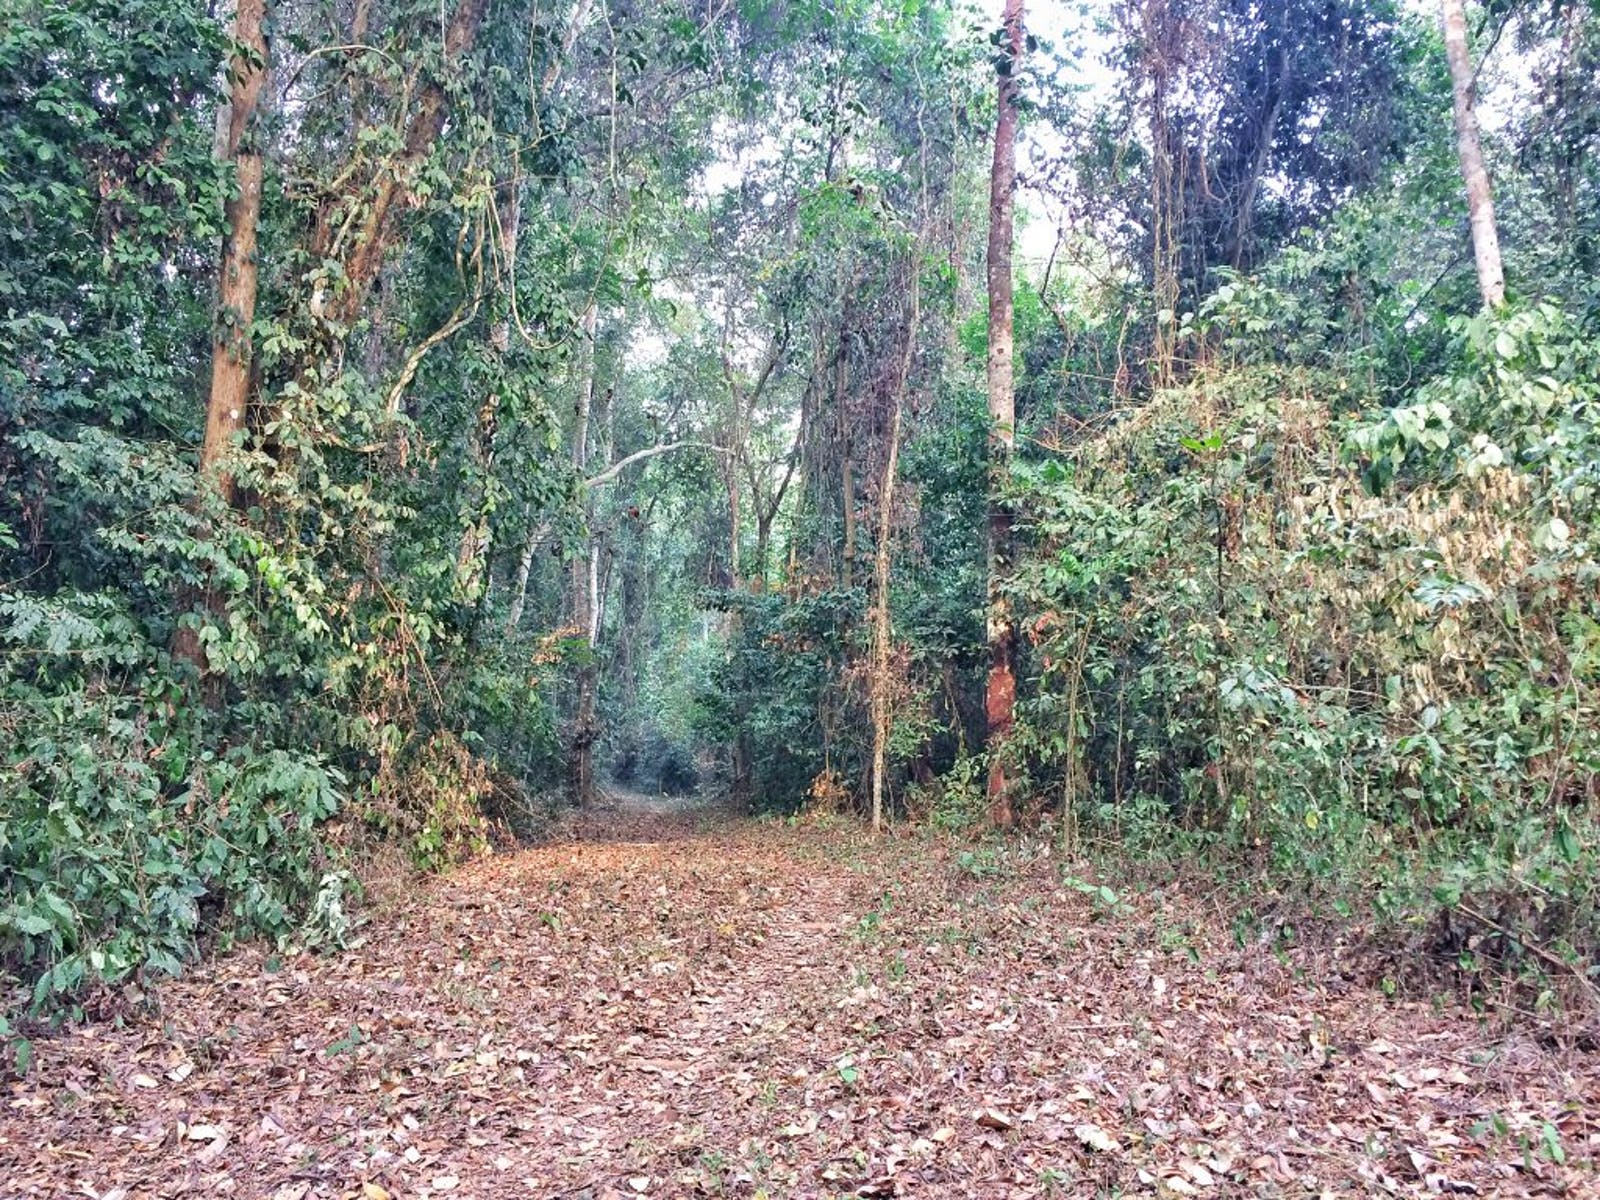 Nigerian Lowland Forests